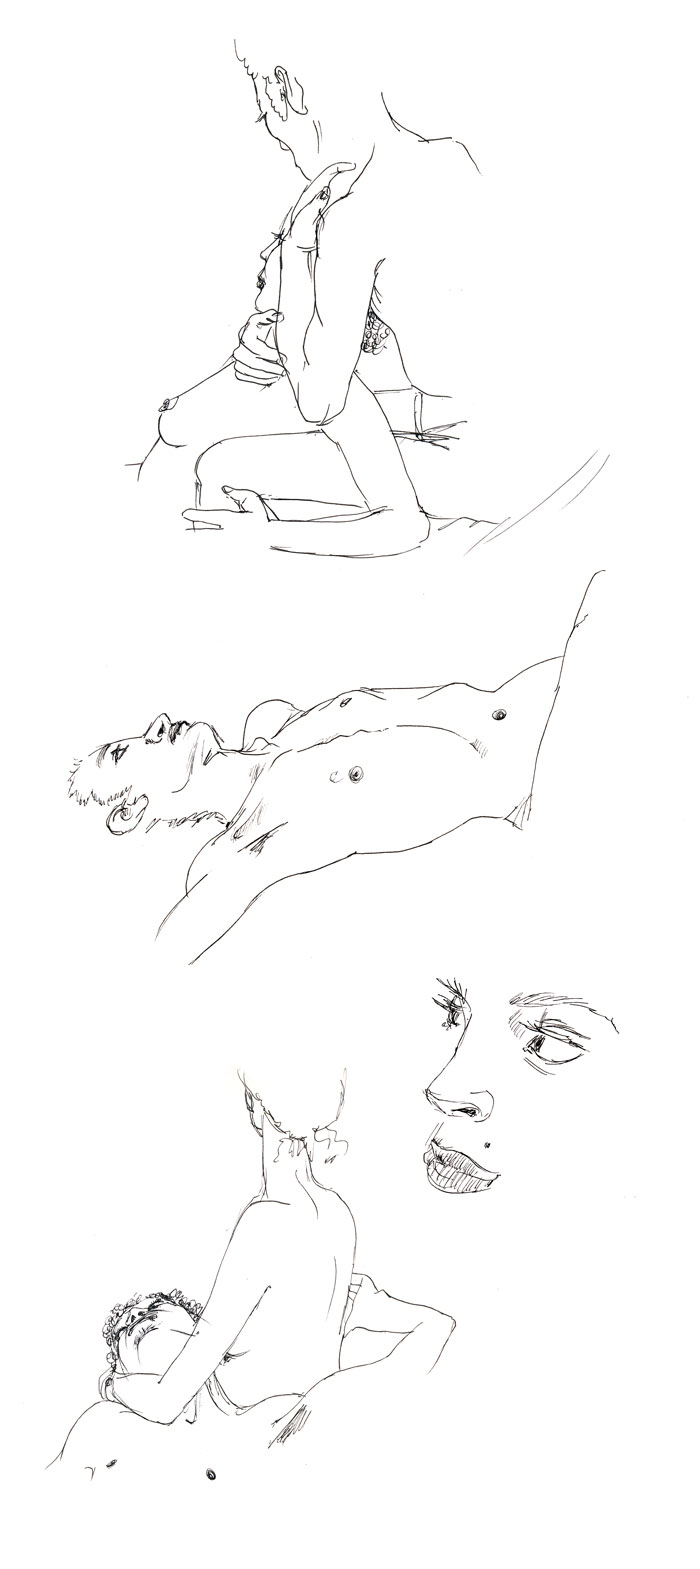 dessin de nu, pose en duo, de profil, aquarelle